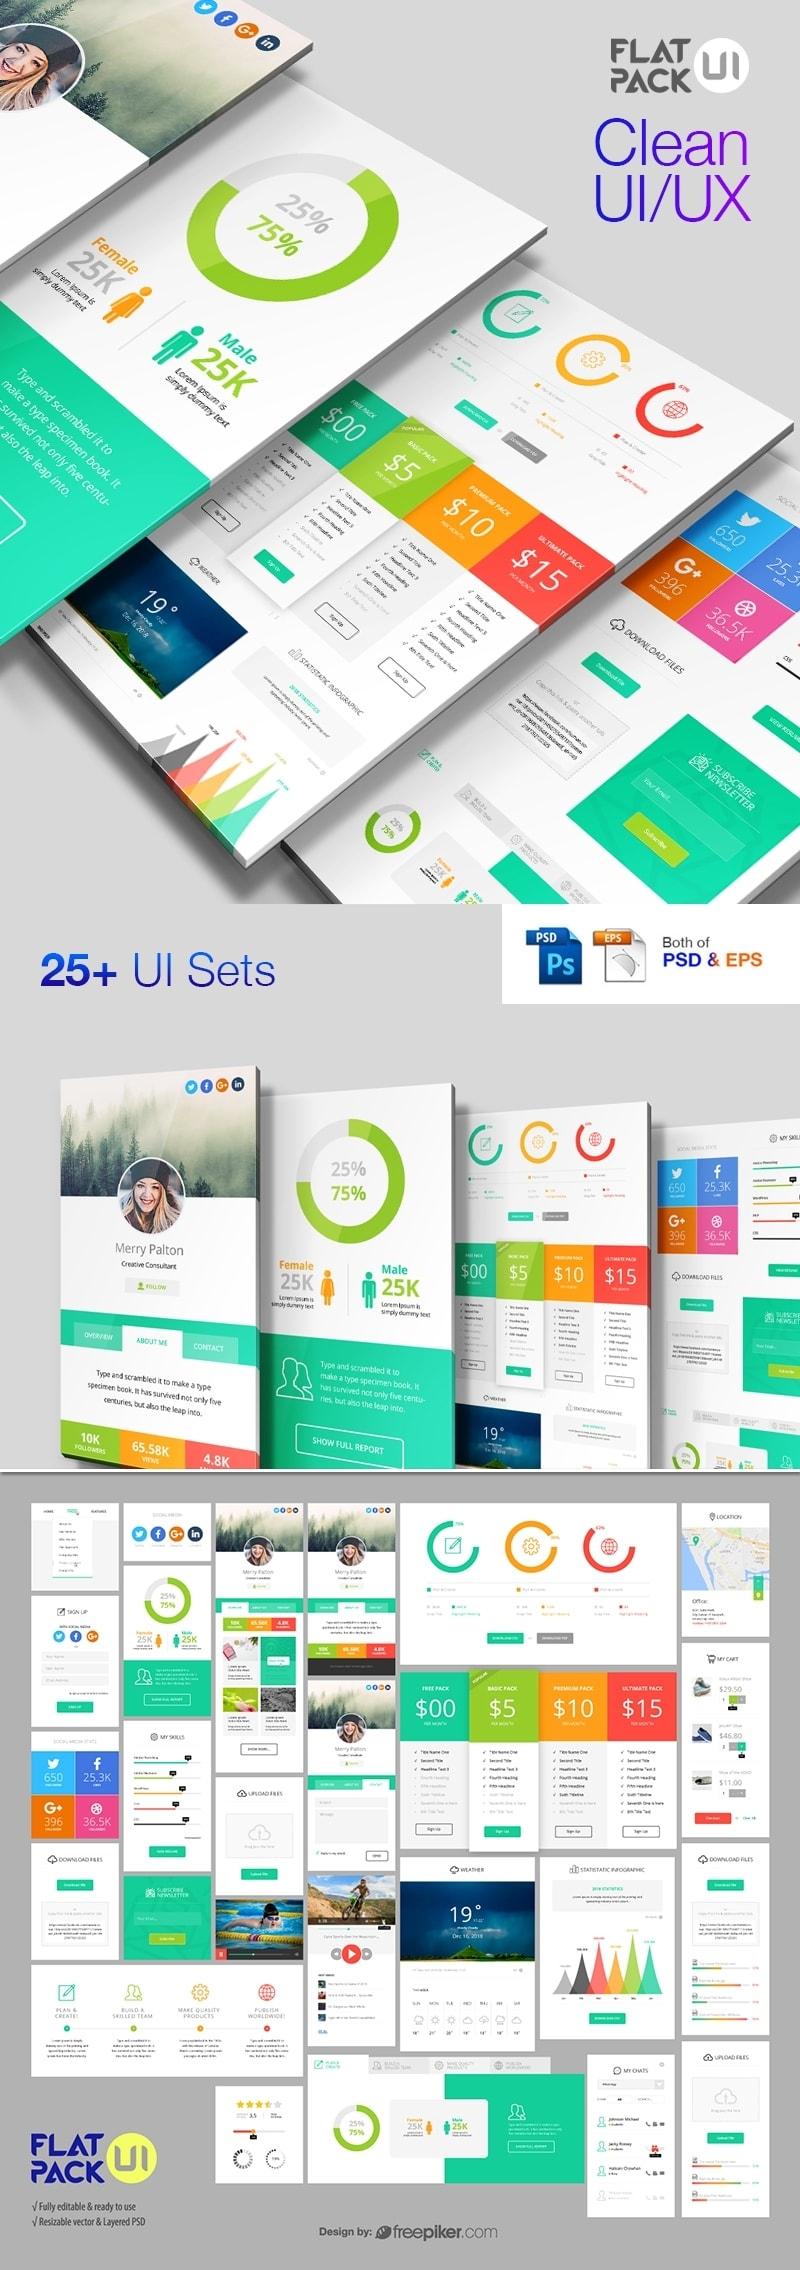 Flat UI Kit PSD & Vector Pack